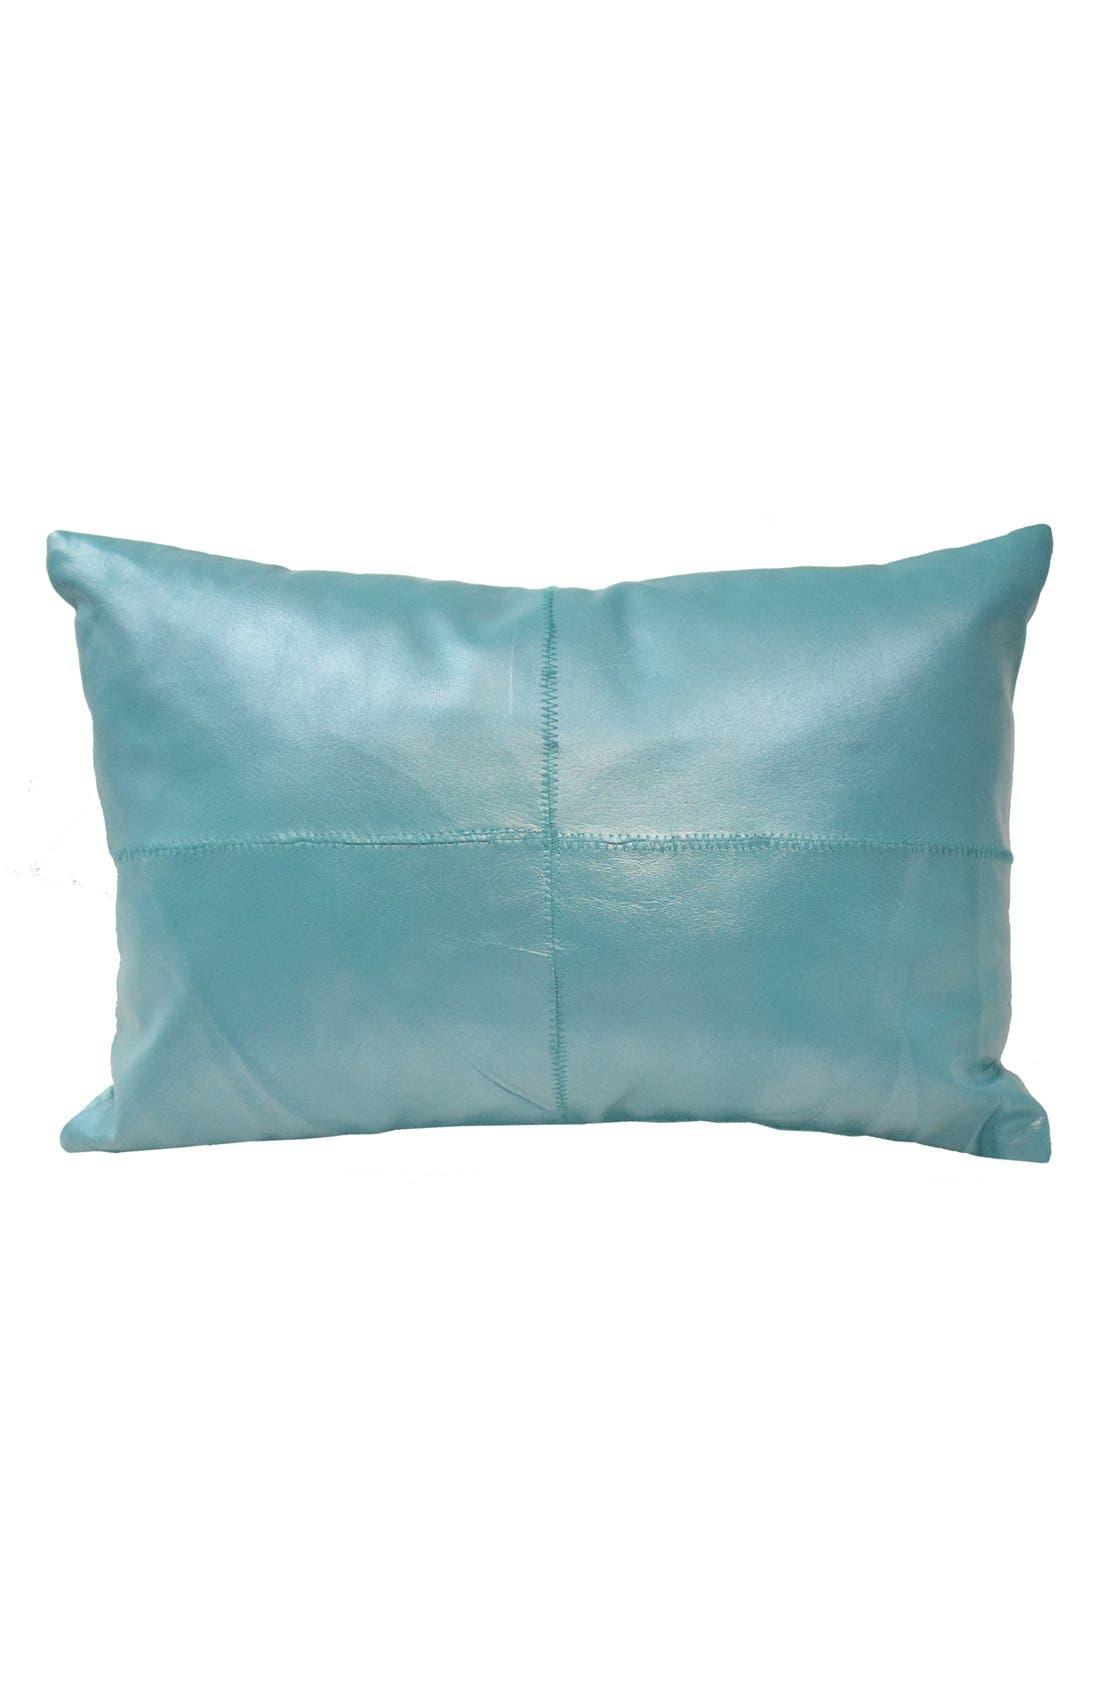 'Feliz' Pillow,                             Alternate thumbnail 3, color,